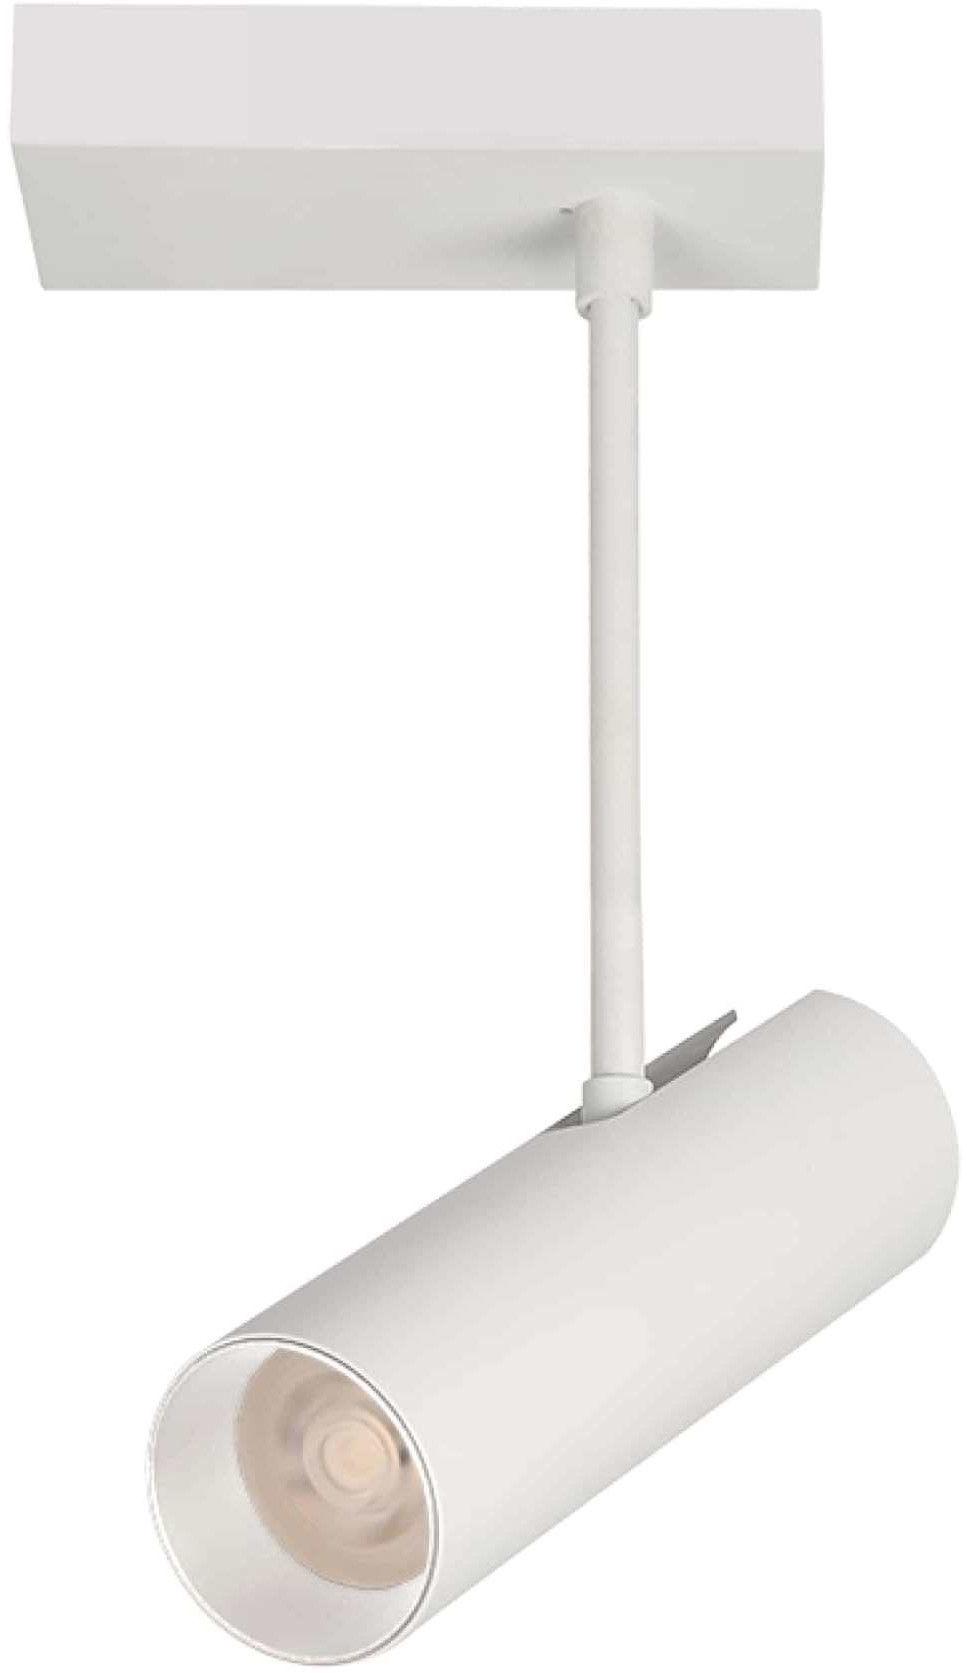 Lampa sufitowa LENS SQUARE SMART (WHITE/WHITE) AZ3956 - Azzardo  Mega rabat przez tel 533810034  Zapytaj o kupon- Zamów